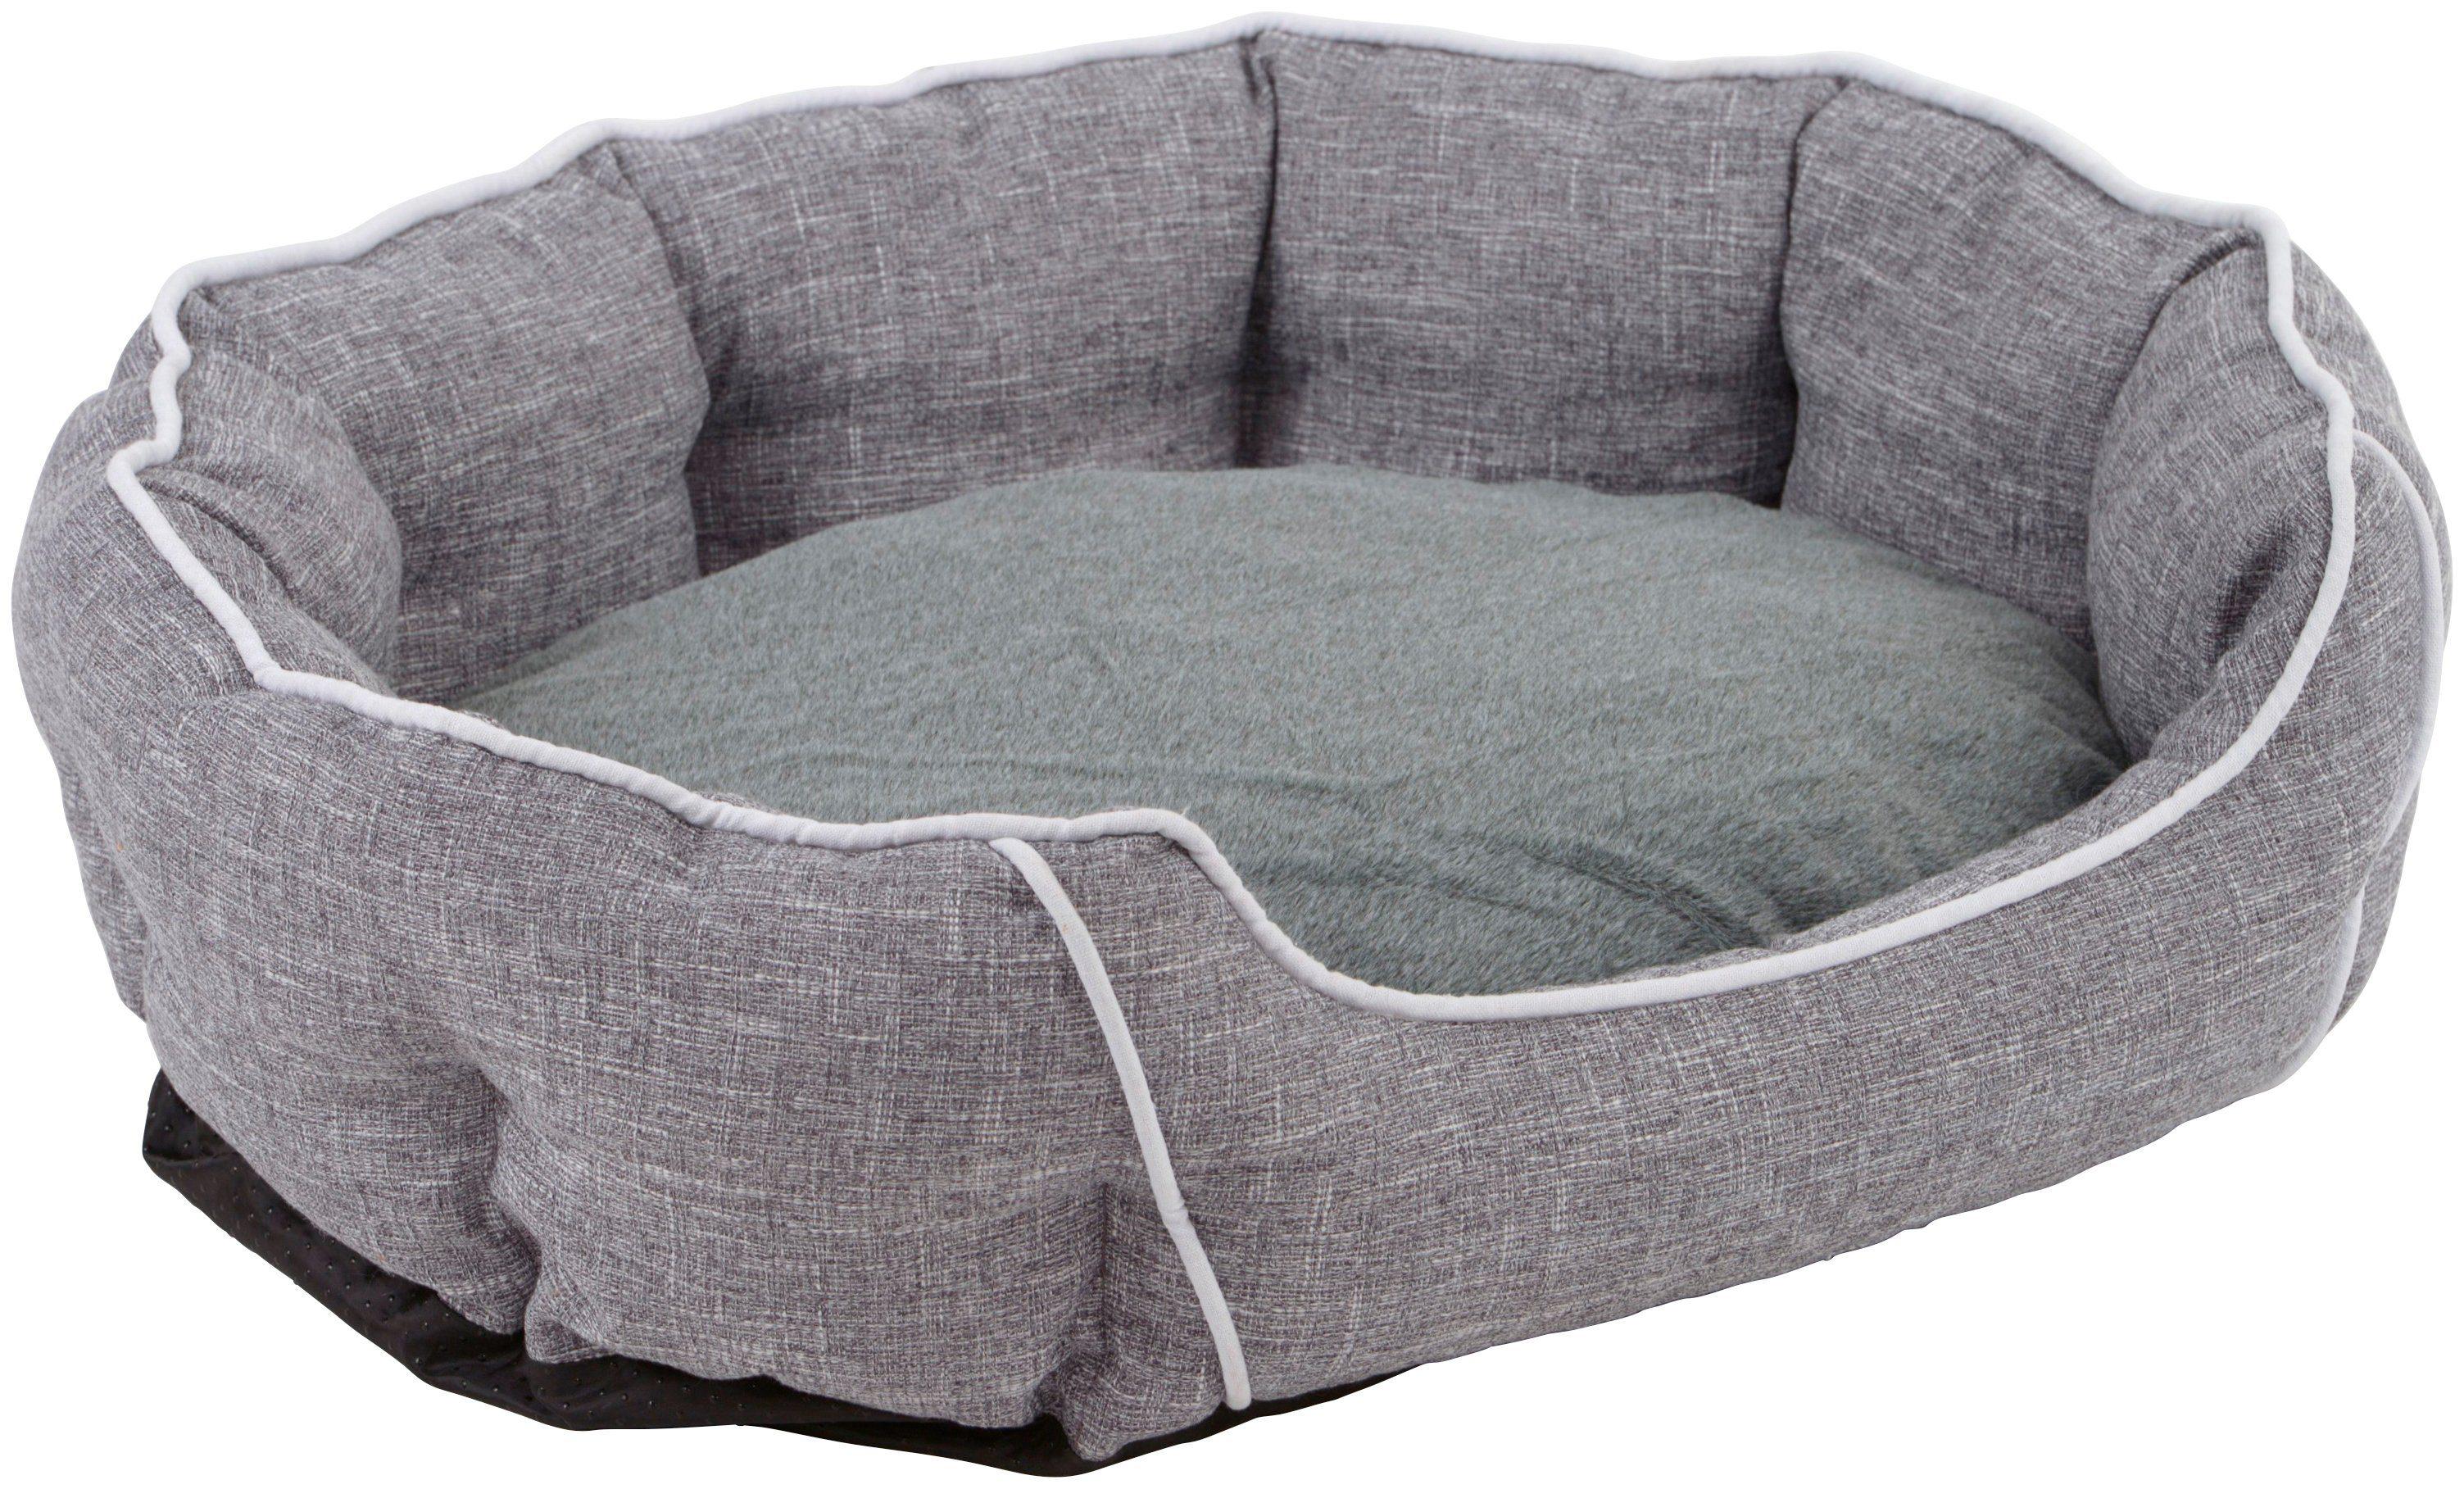 SILVIO DESIGN Hundebett »Cassy L«, BxLxH: 46x55x18 cm